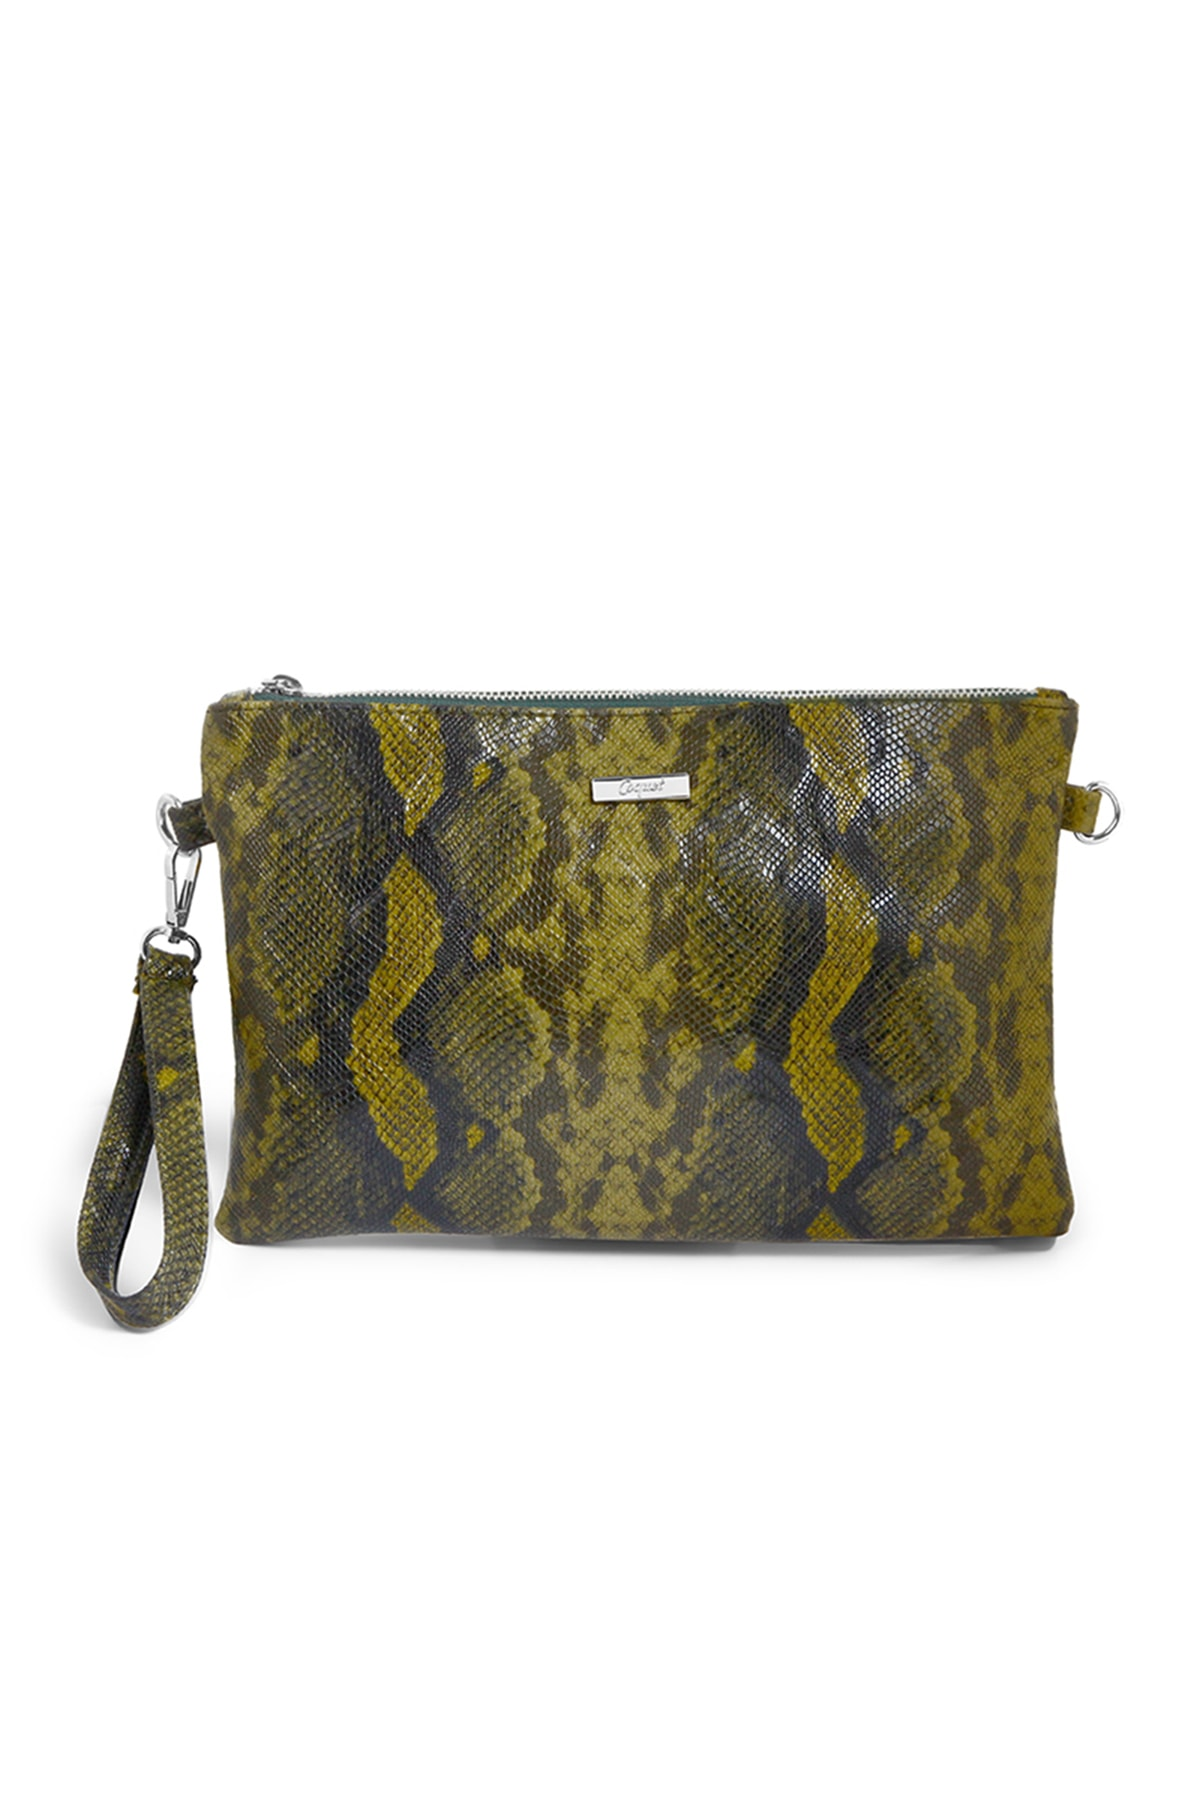 Coquet Accessories Kadın Yeşil Karite Clutch 19G3U13N078 1